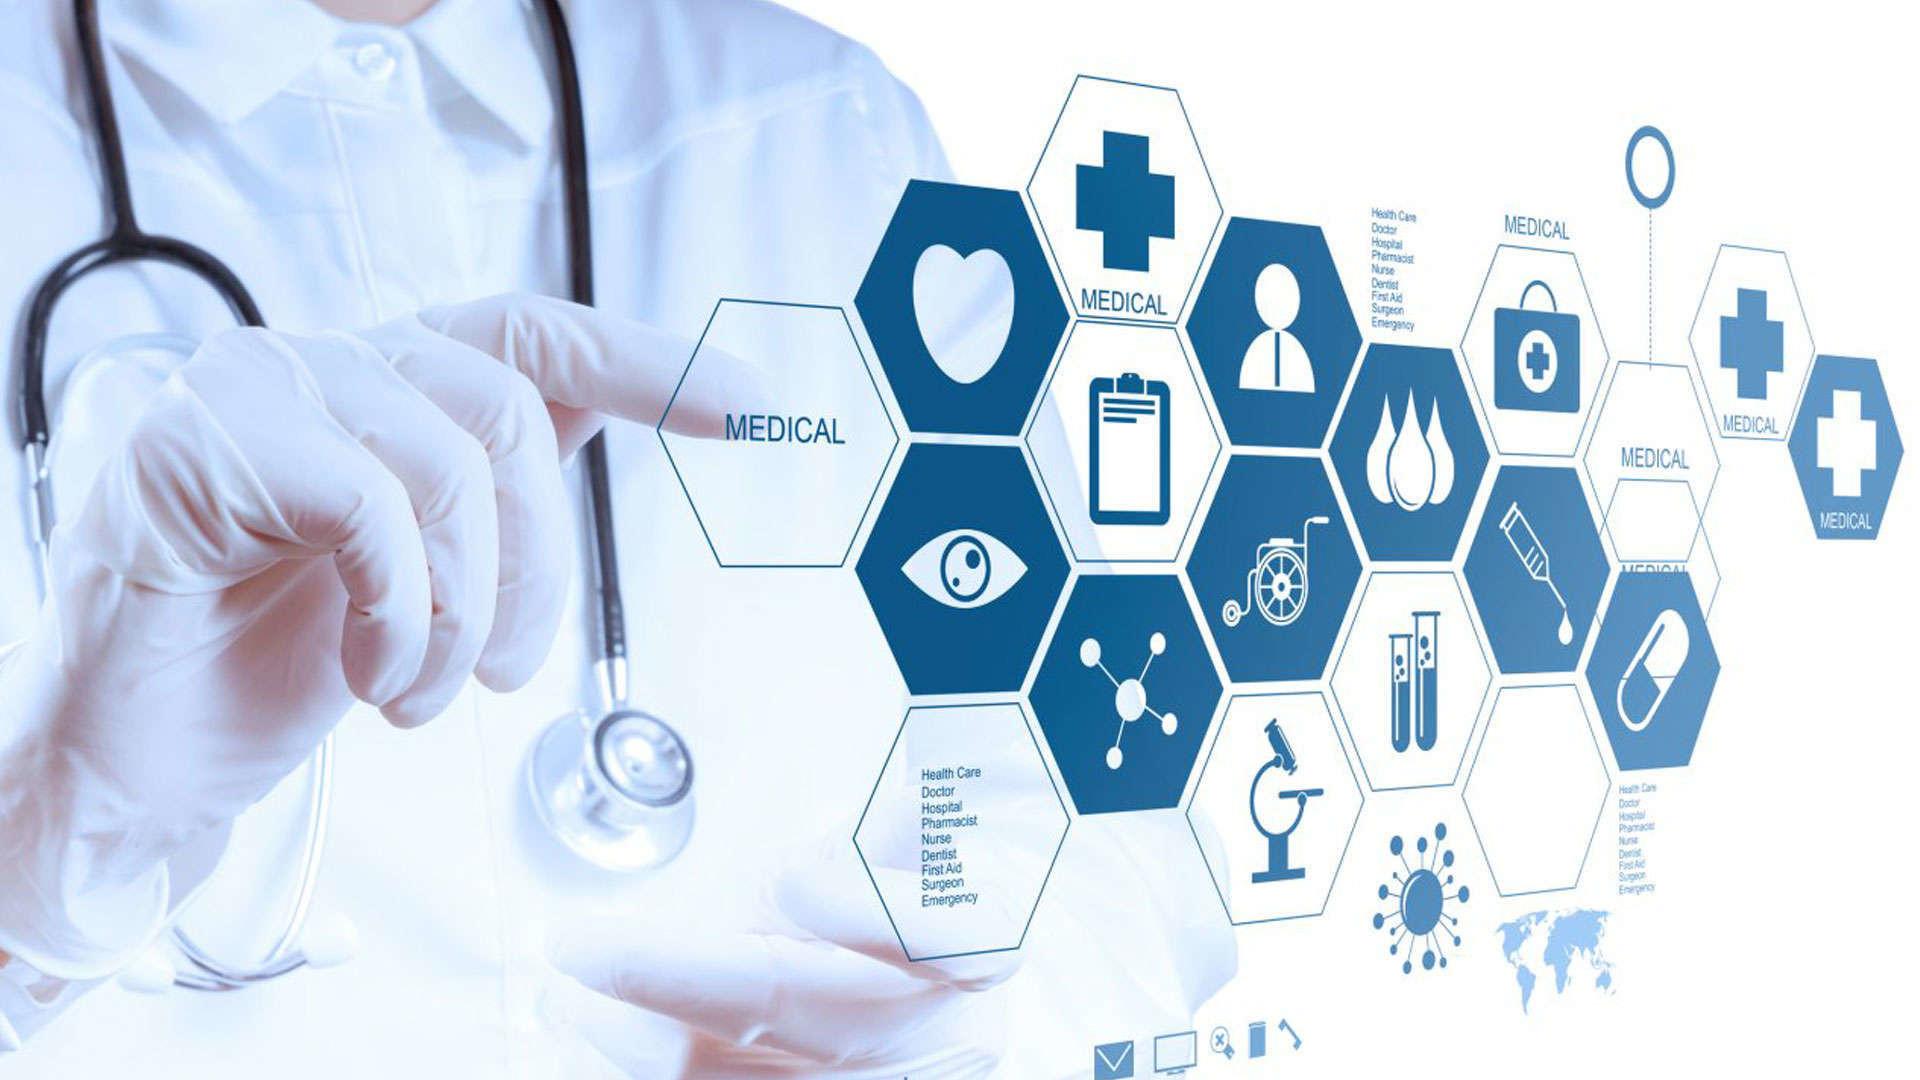 HD Medical Wallpaper (61+ Images